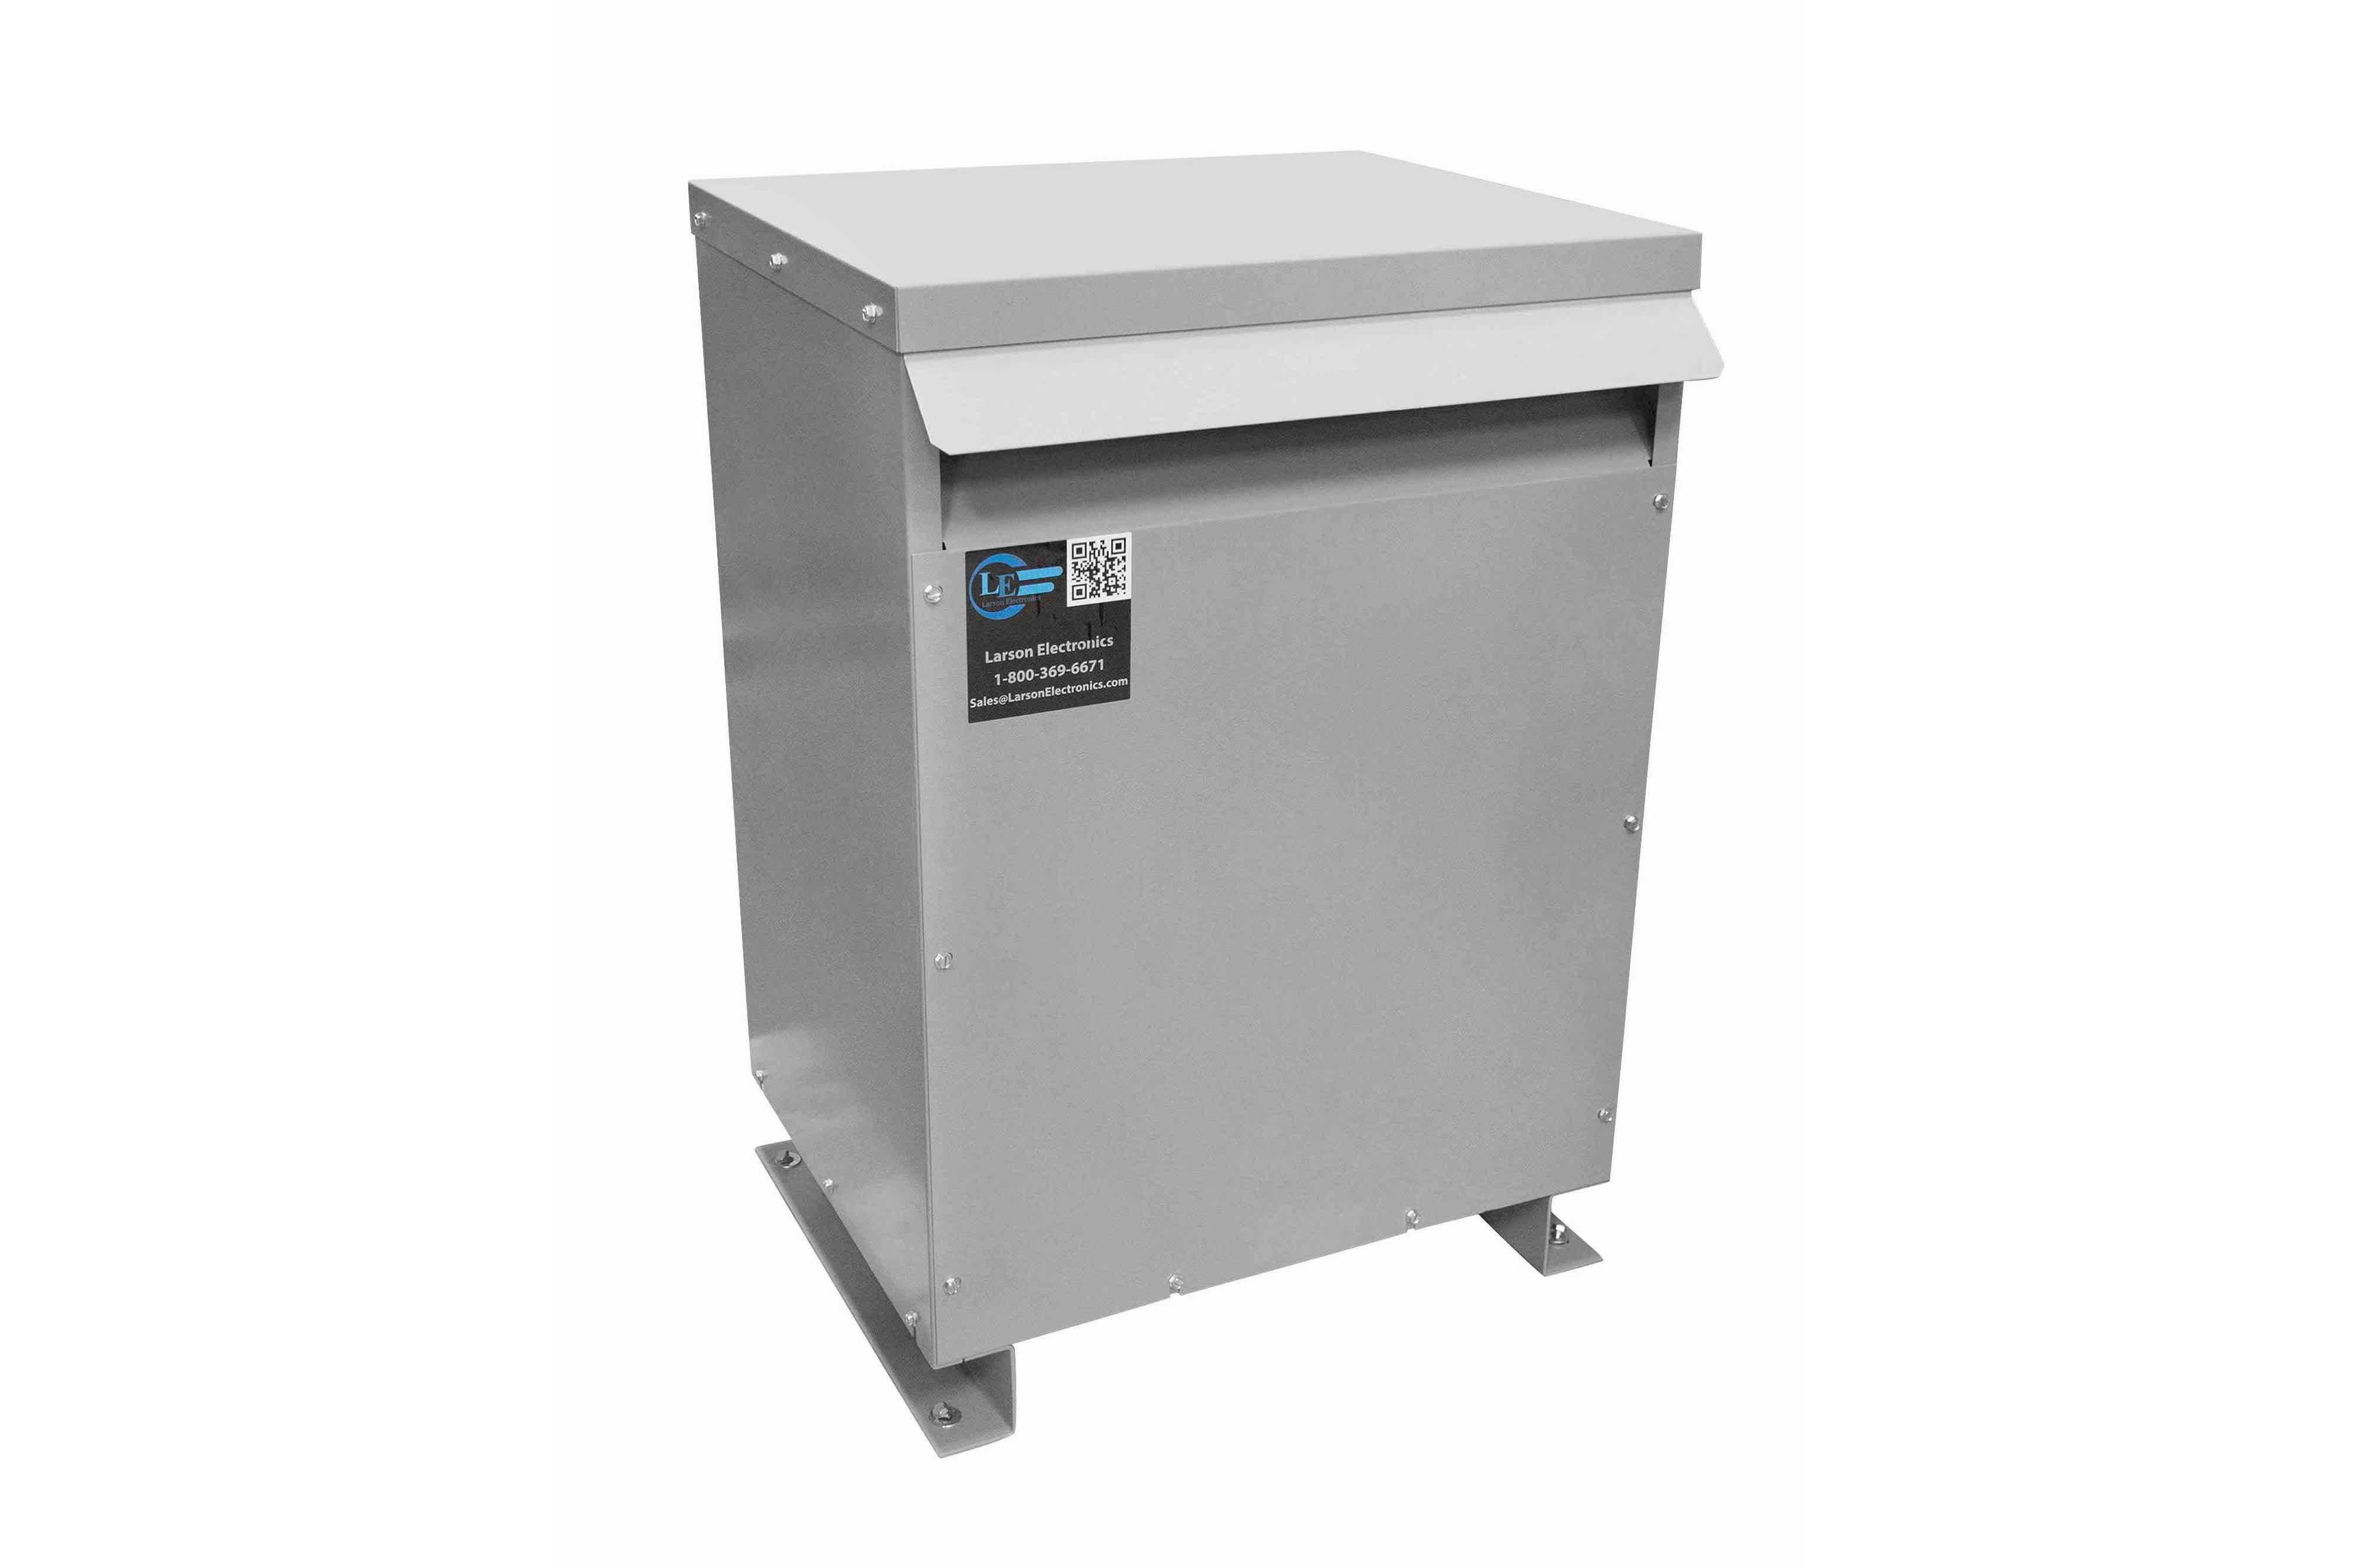 45 kVA 3PH Isolation Transformer, 380V Wye Primary, 240V/120 Delta Secondary, N3R, Ventilated, 60 Hz